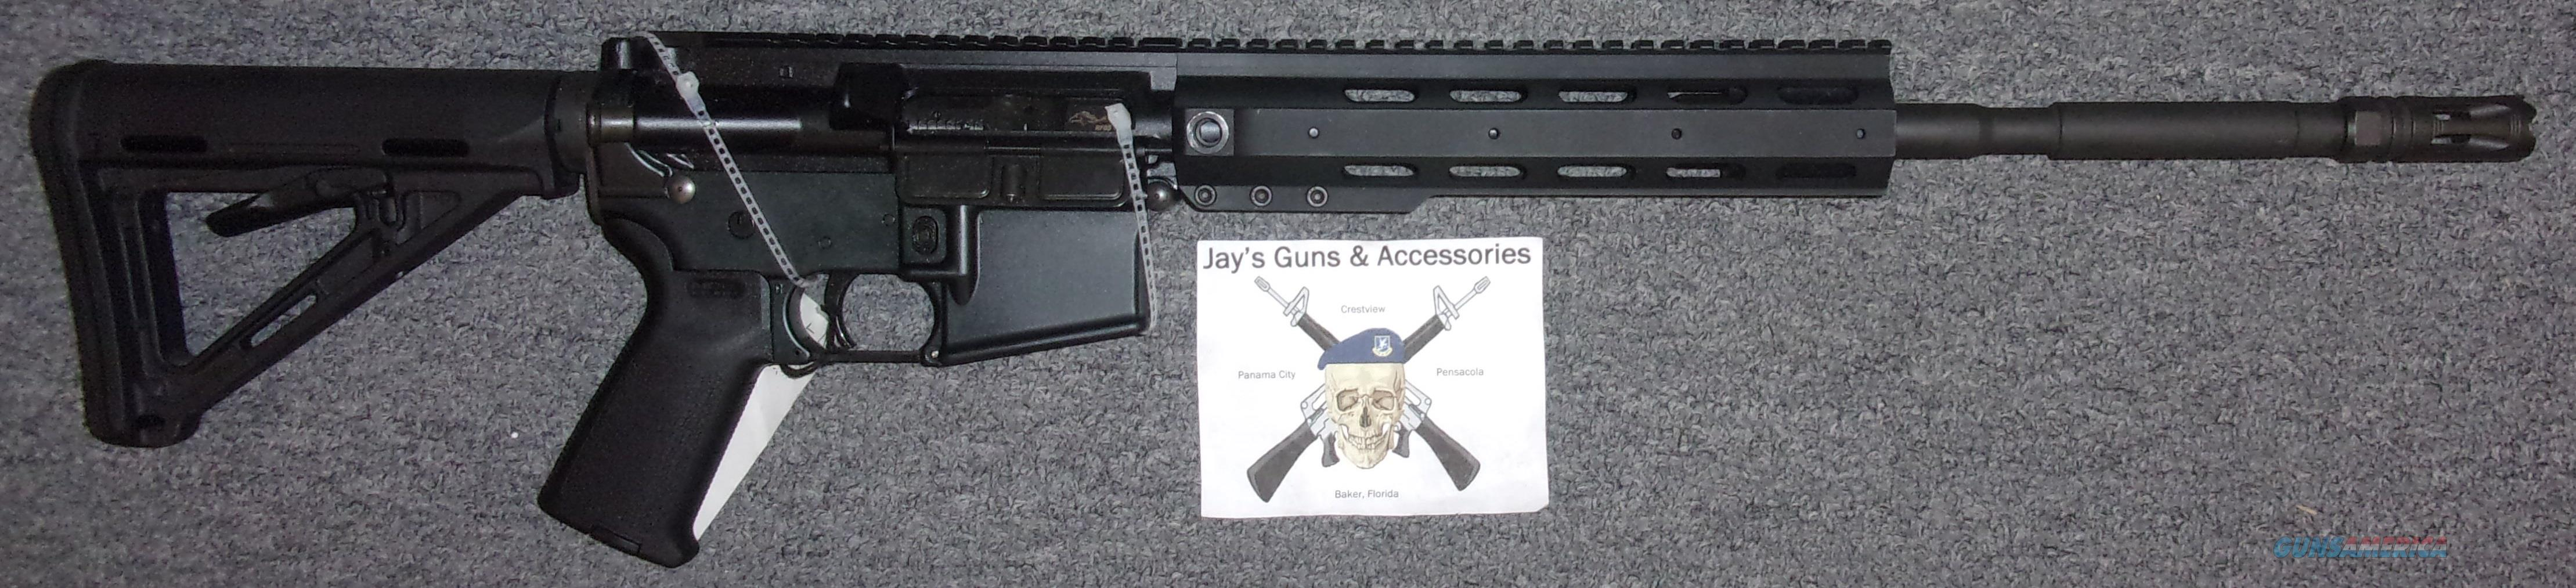 Anderson Mfg. AM-15 (RF85 Treatment)  Guns > Rifles > AR-15 Rifles - Small Manufacturers > Complete Rifle